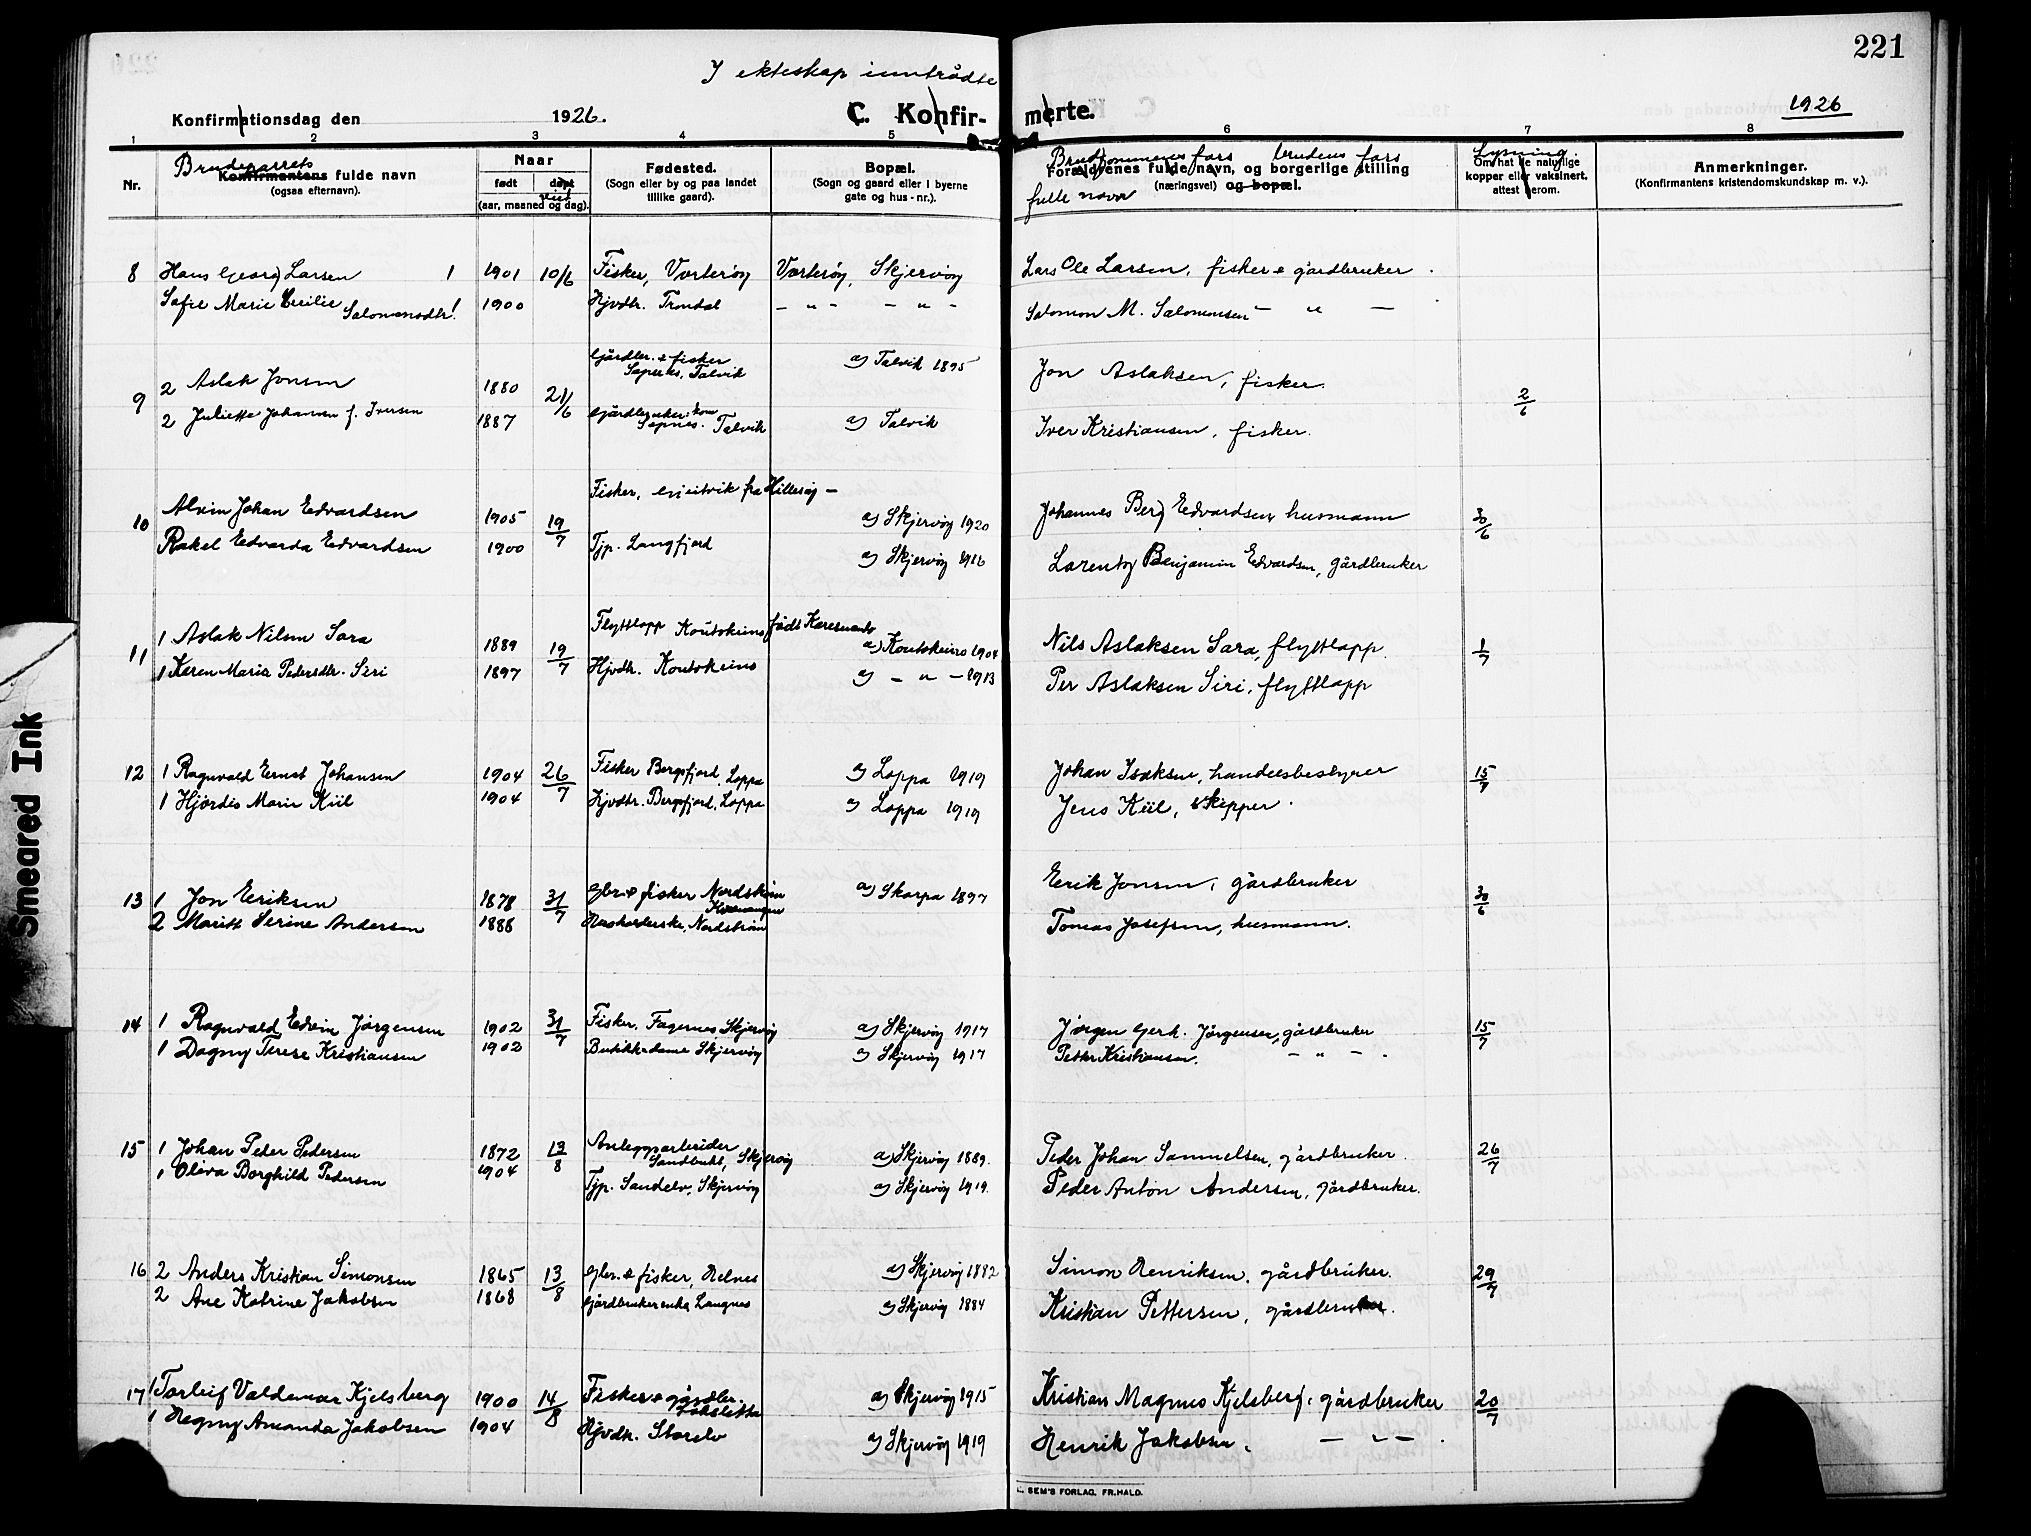 SATØ, Skjervøy sokneprestkontor, H/Ha/Hab/L0009klokker: Klokkerbok nr. 9, 1911-1926, s. 221